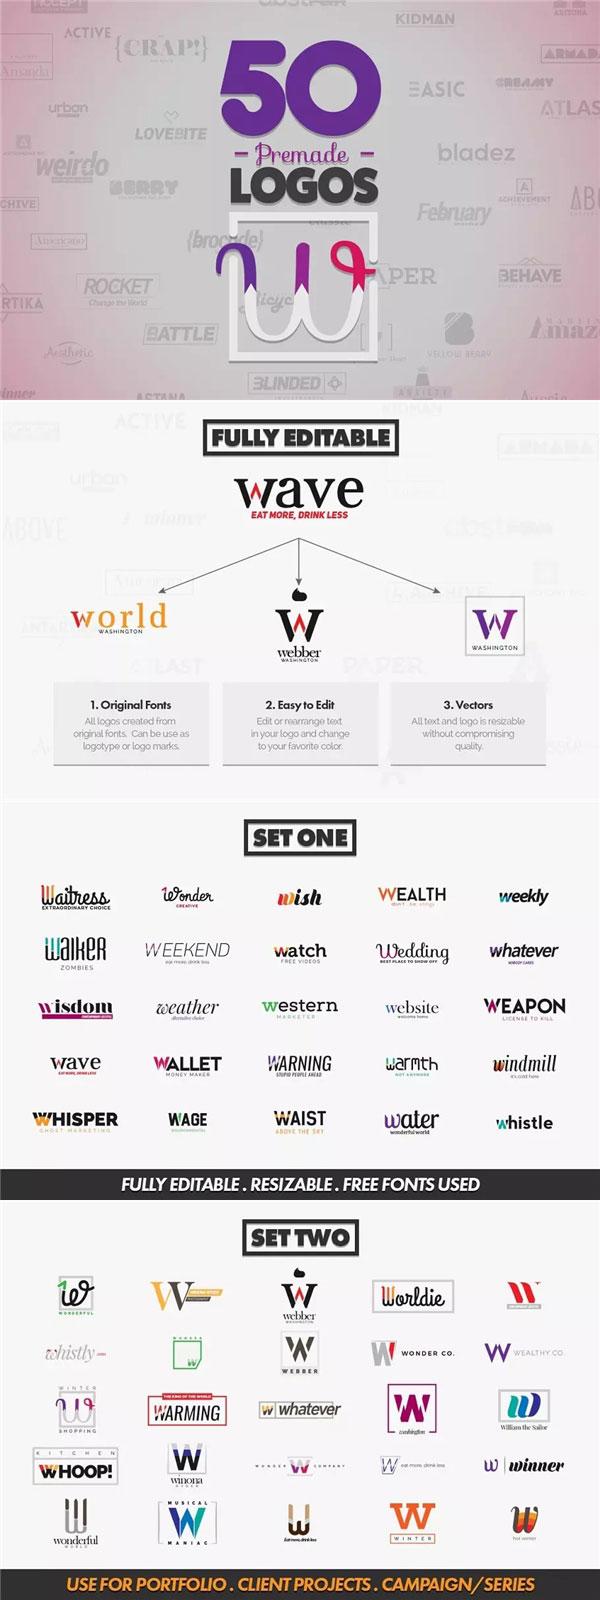 W造型的logo模板